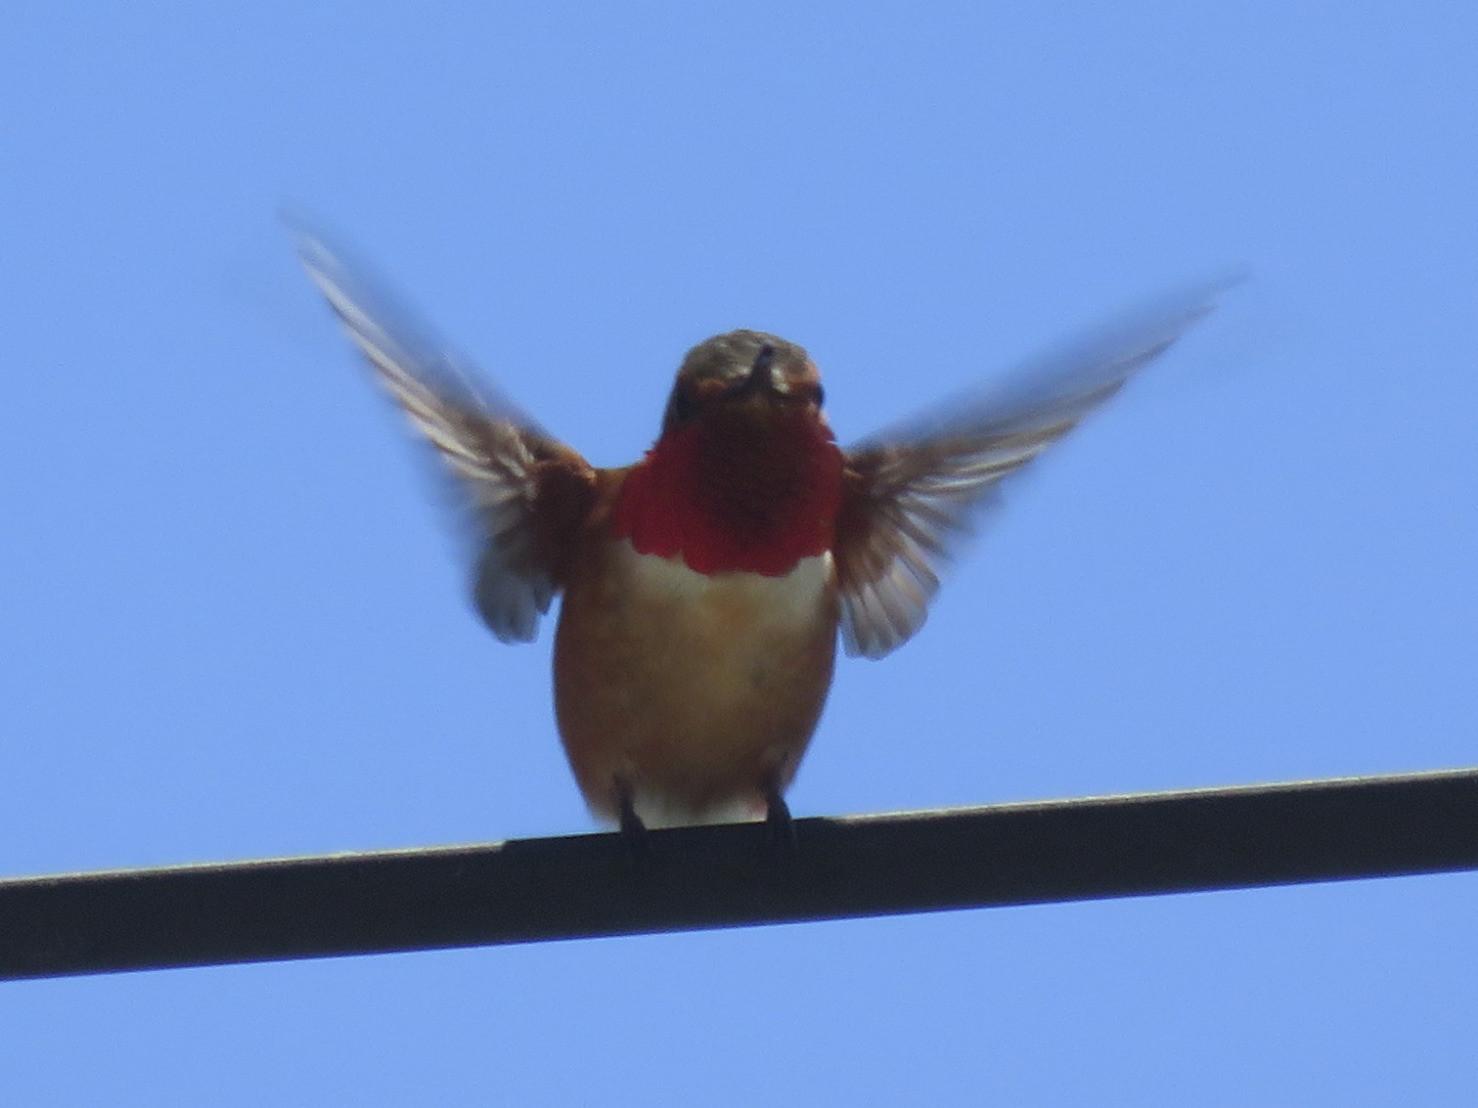 kelsonv: Flappy bird?